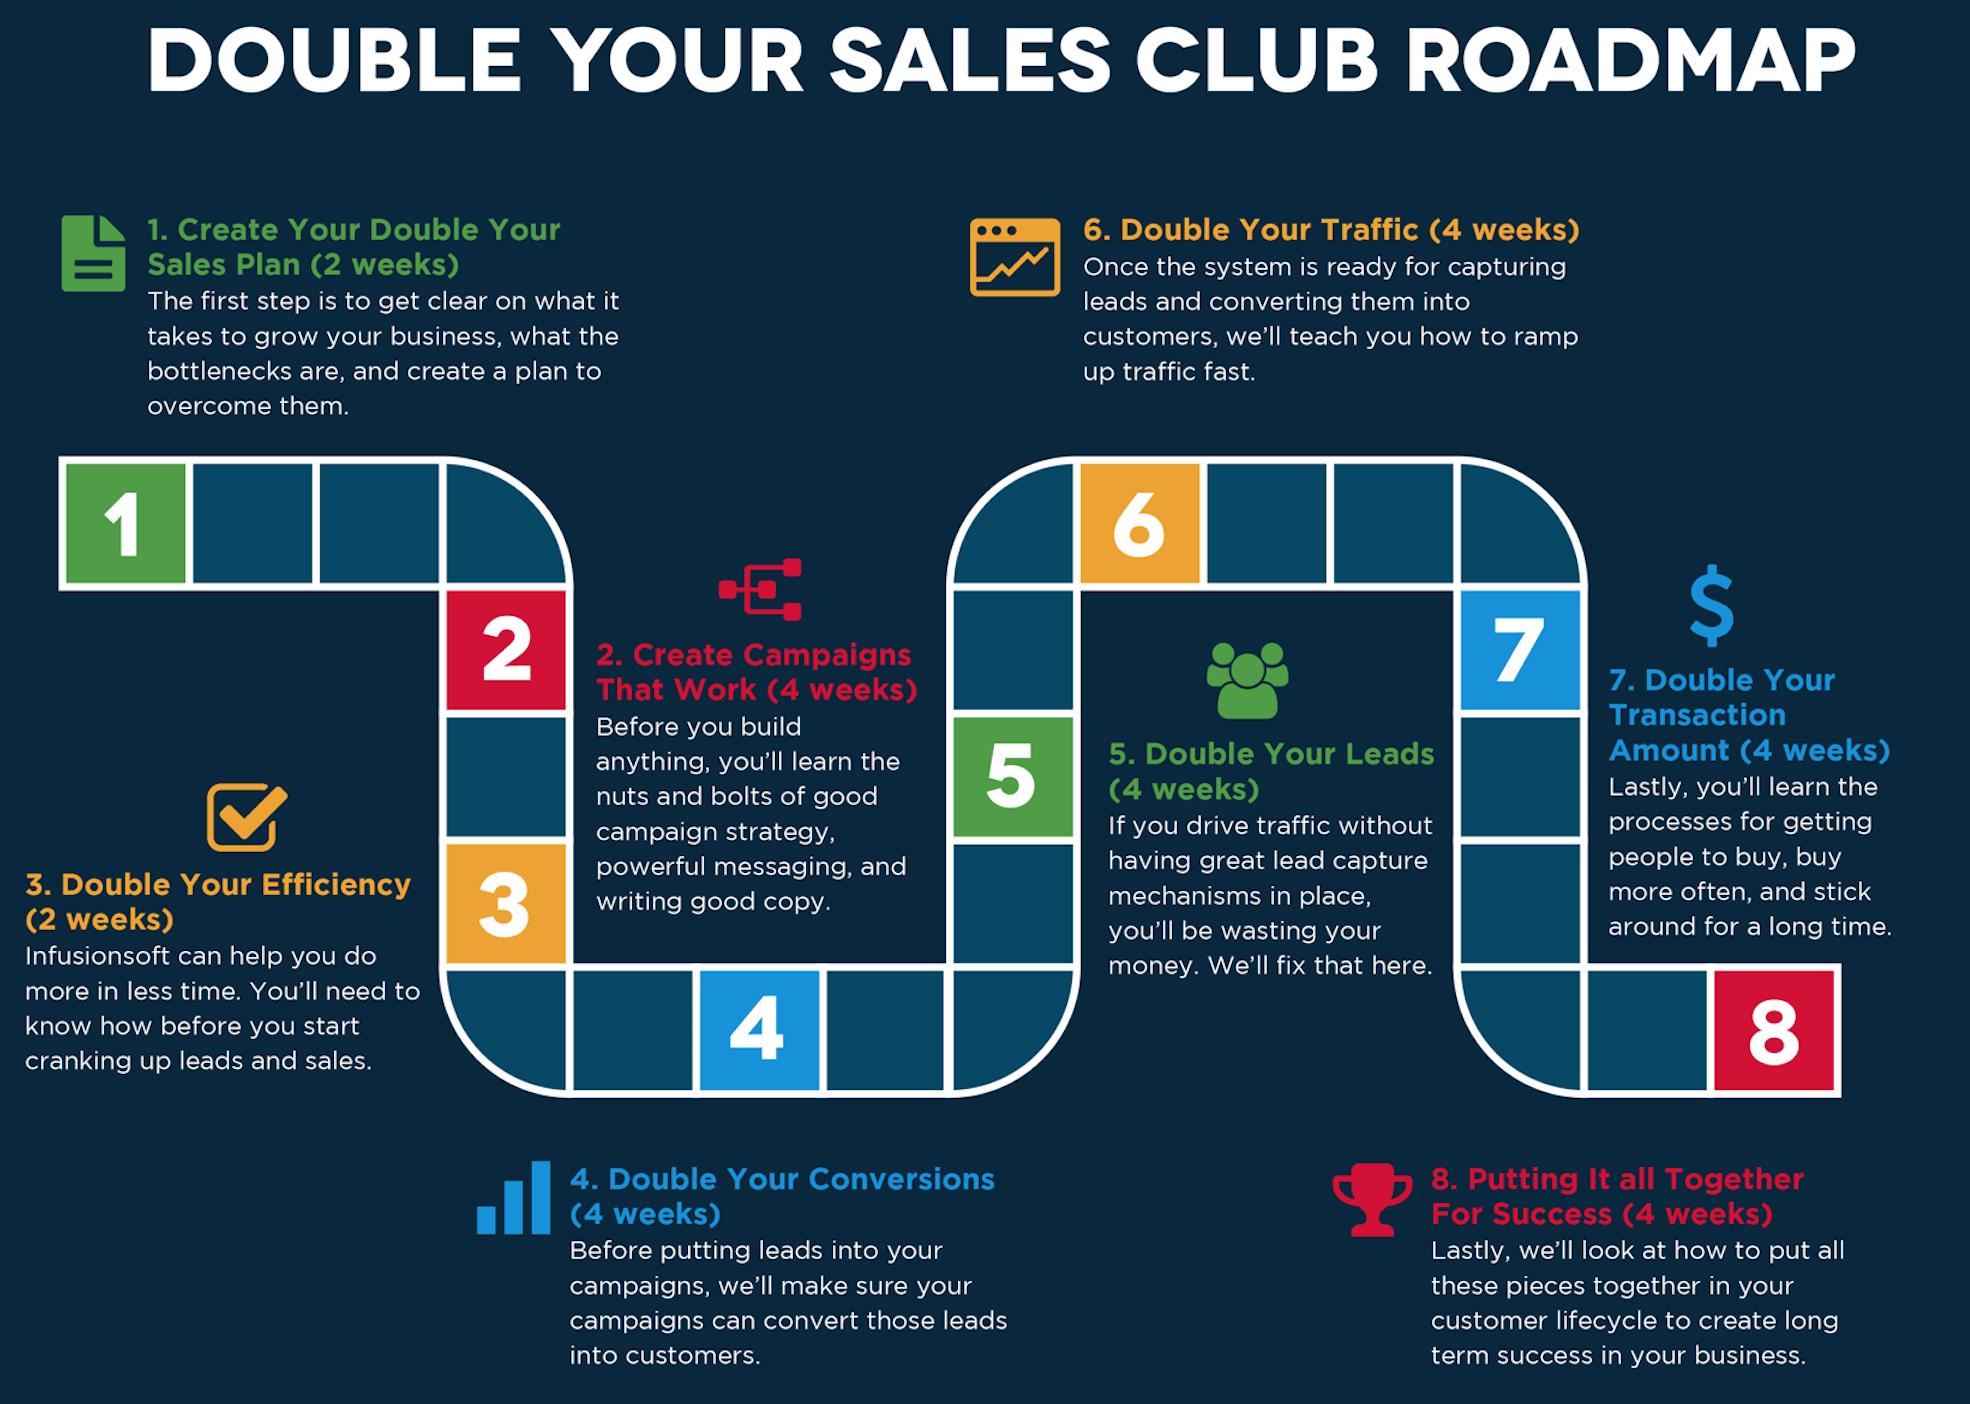 dys-club-roadmap-no-sidebar